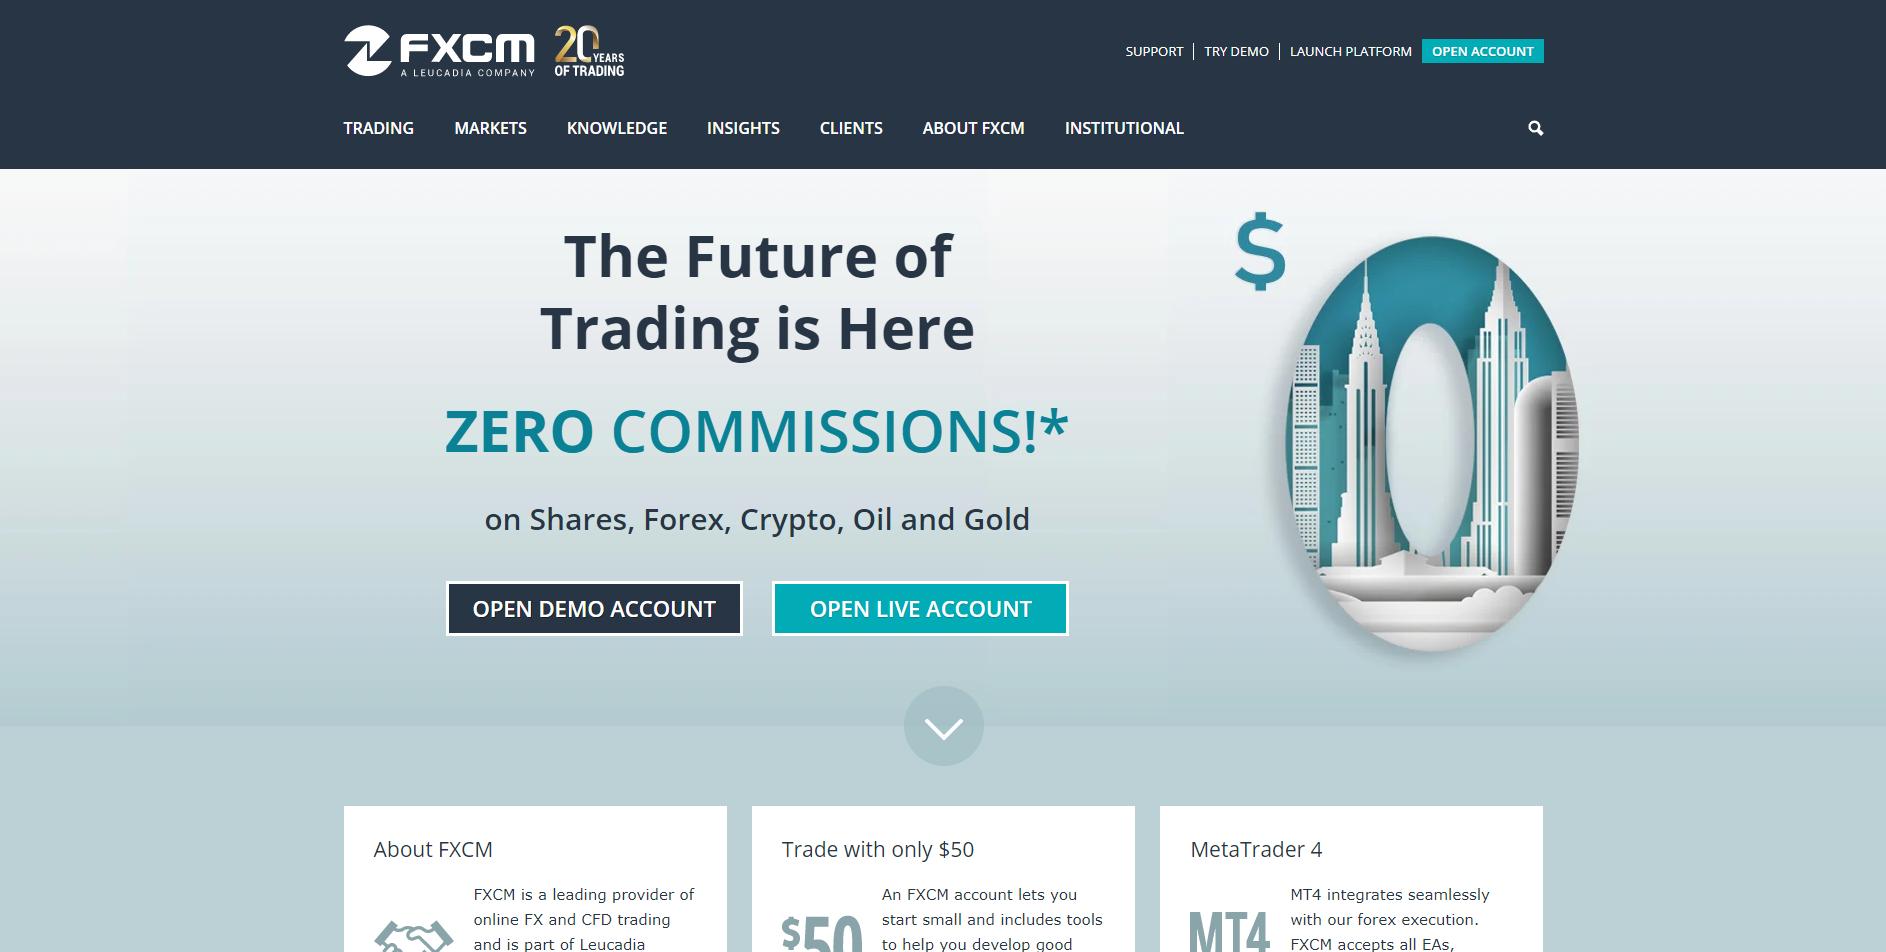 Official website of the forex broker FXCM in UK